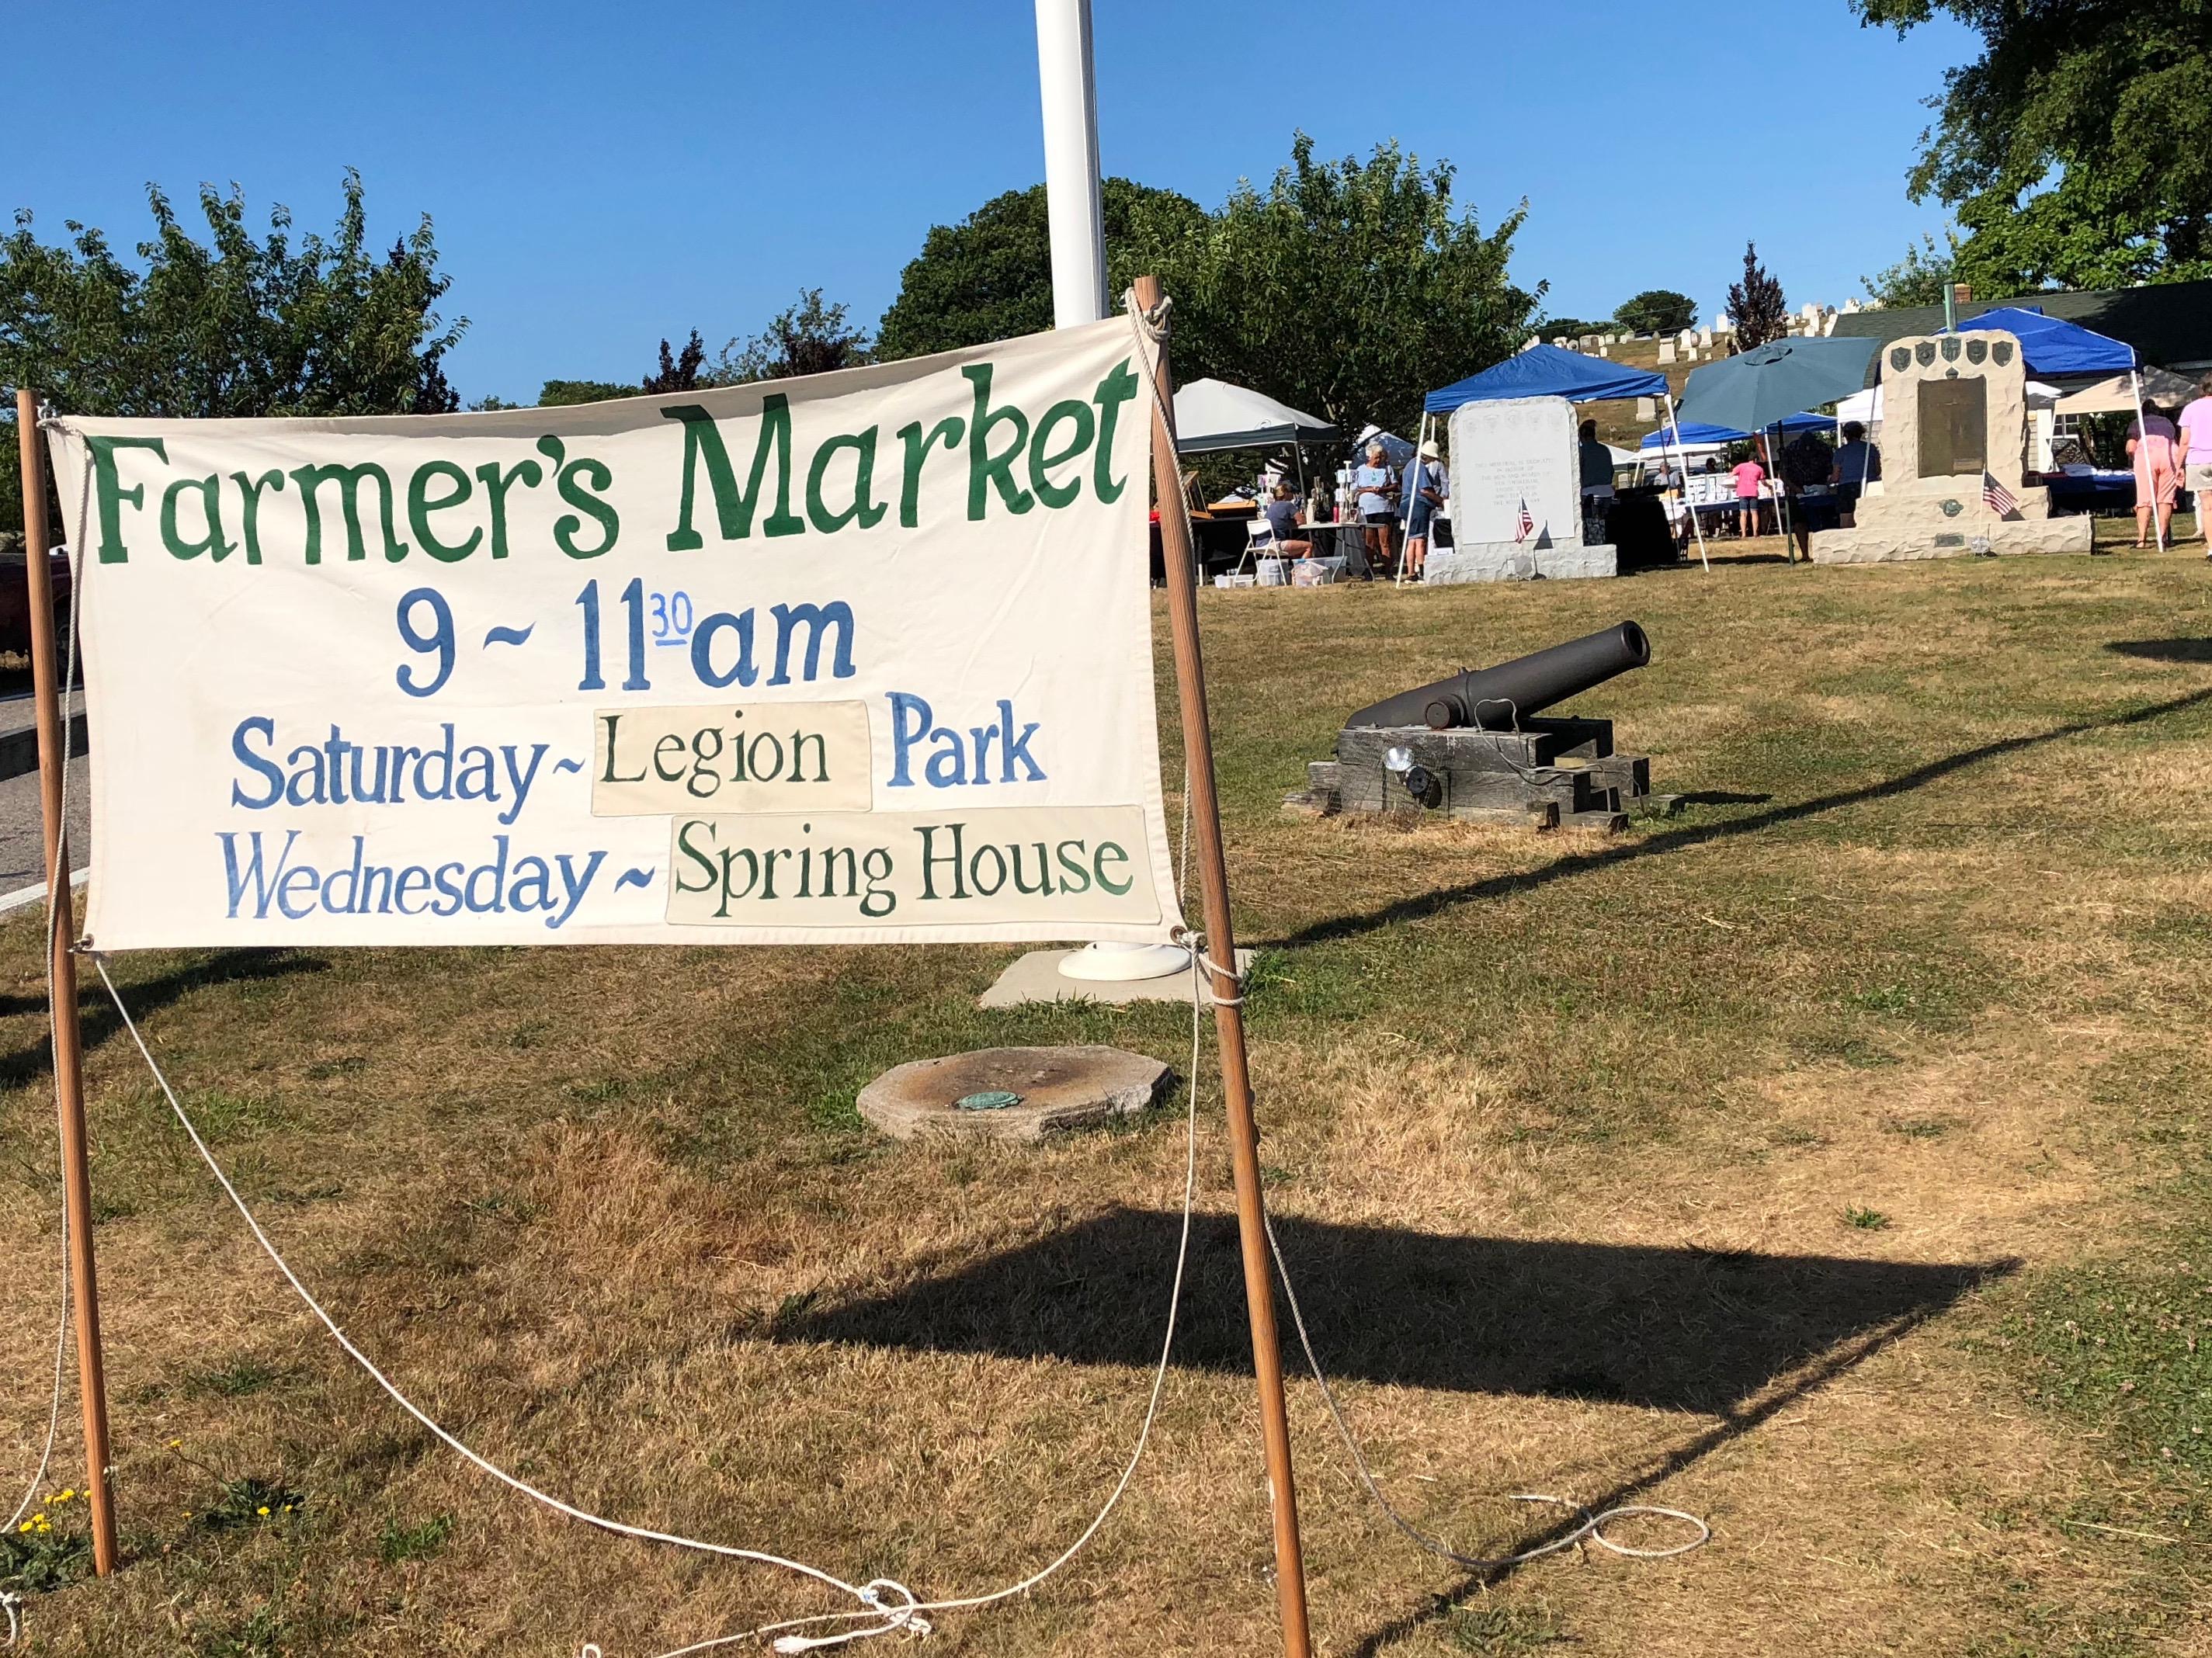 072118-farmers-market-at-American-Legion